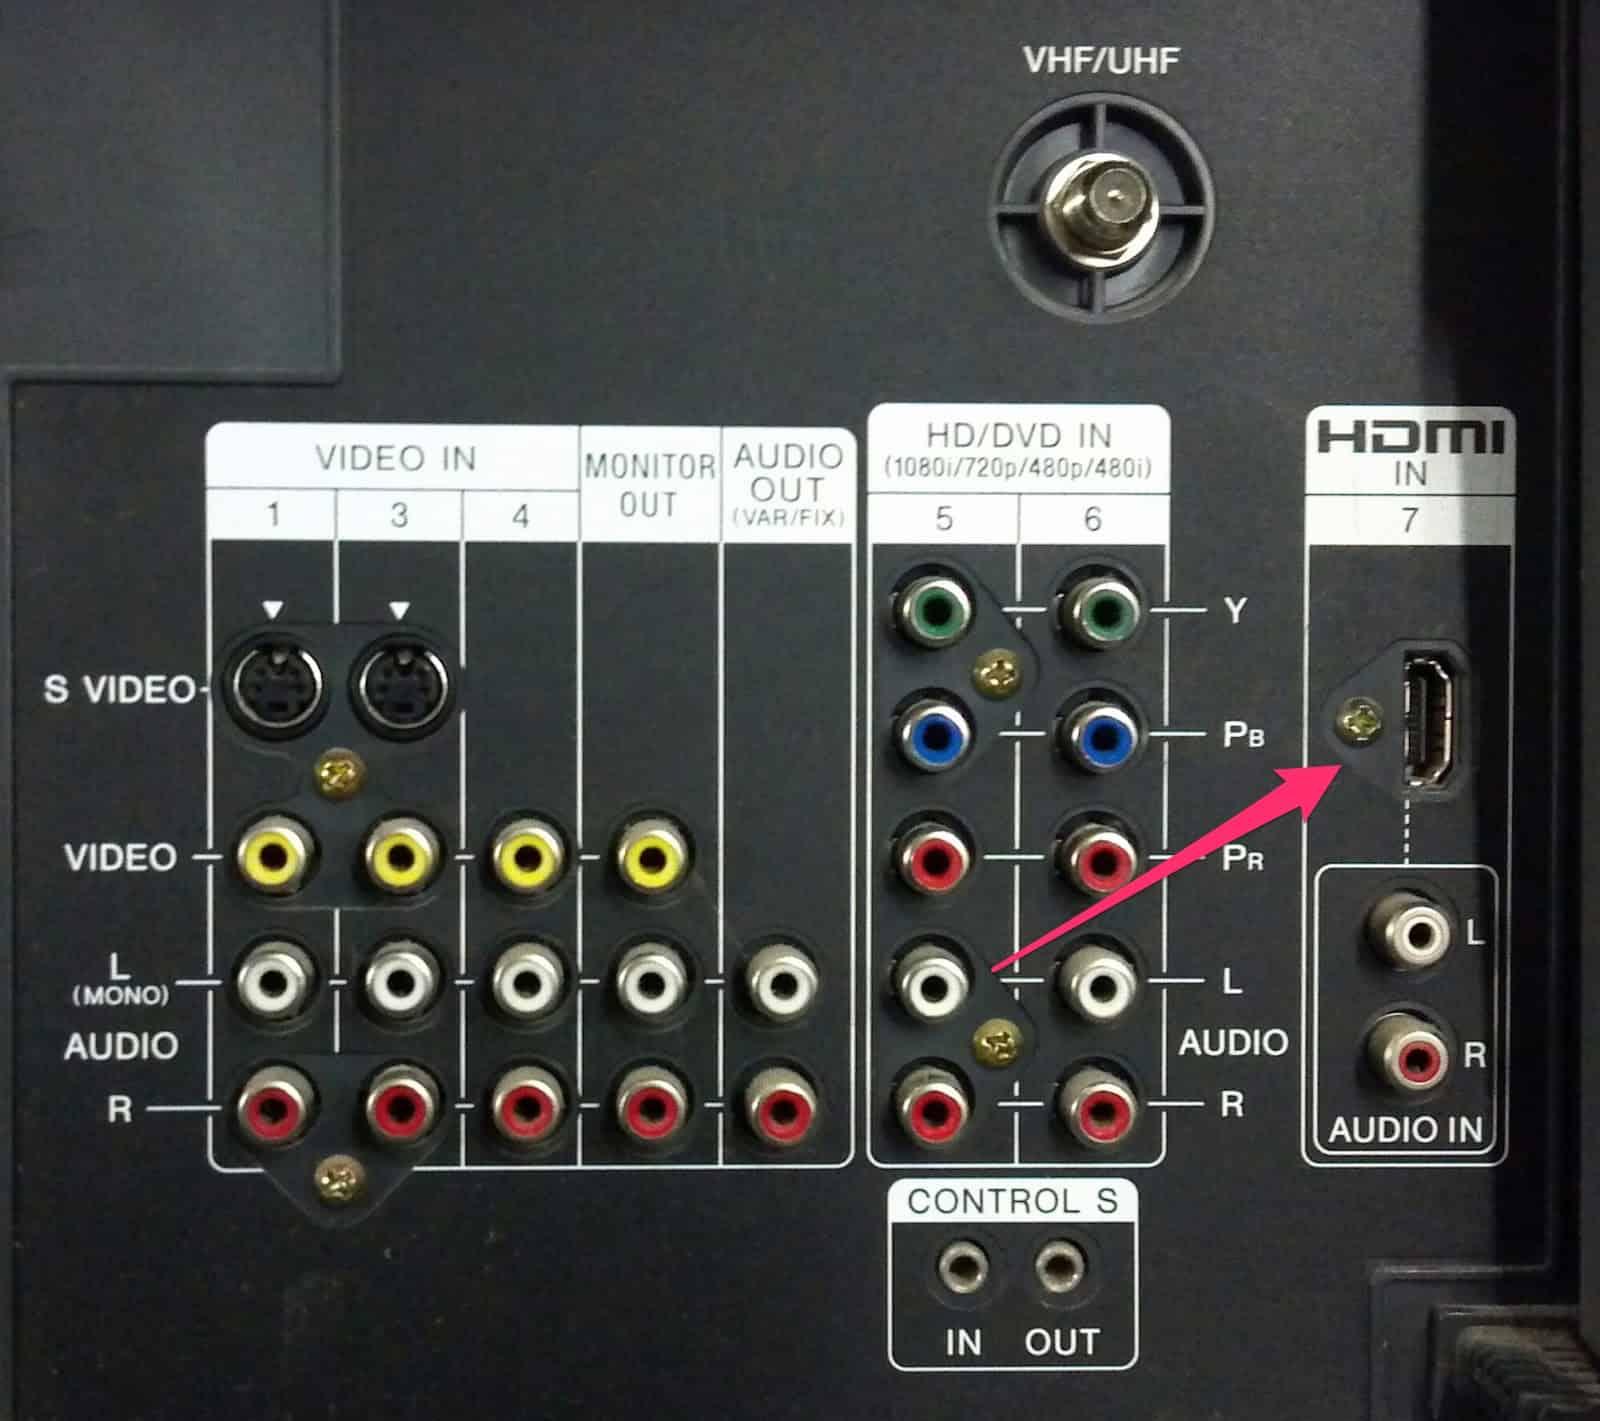 hdmi_monitor